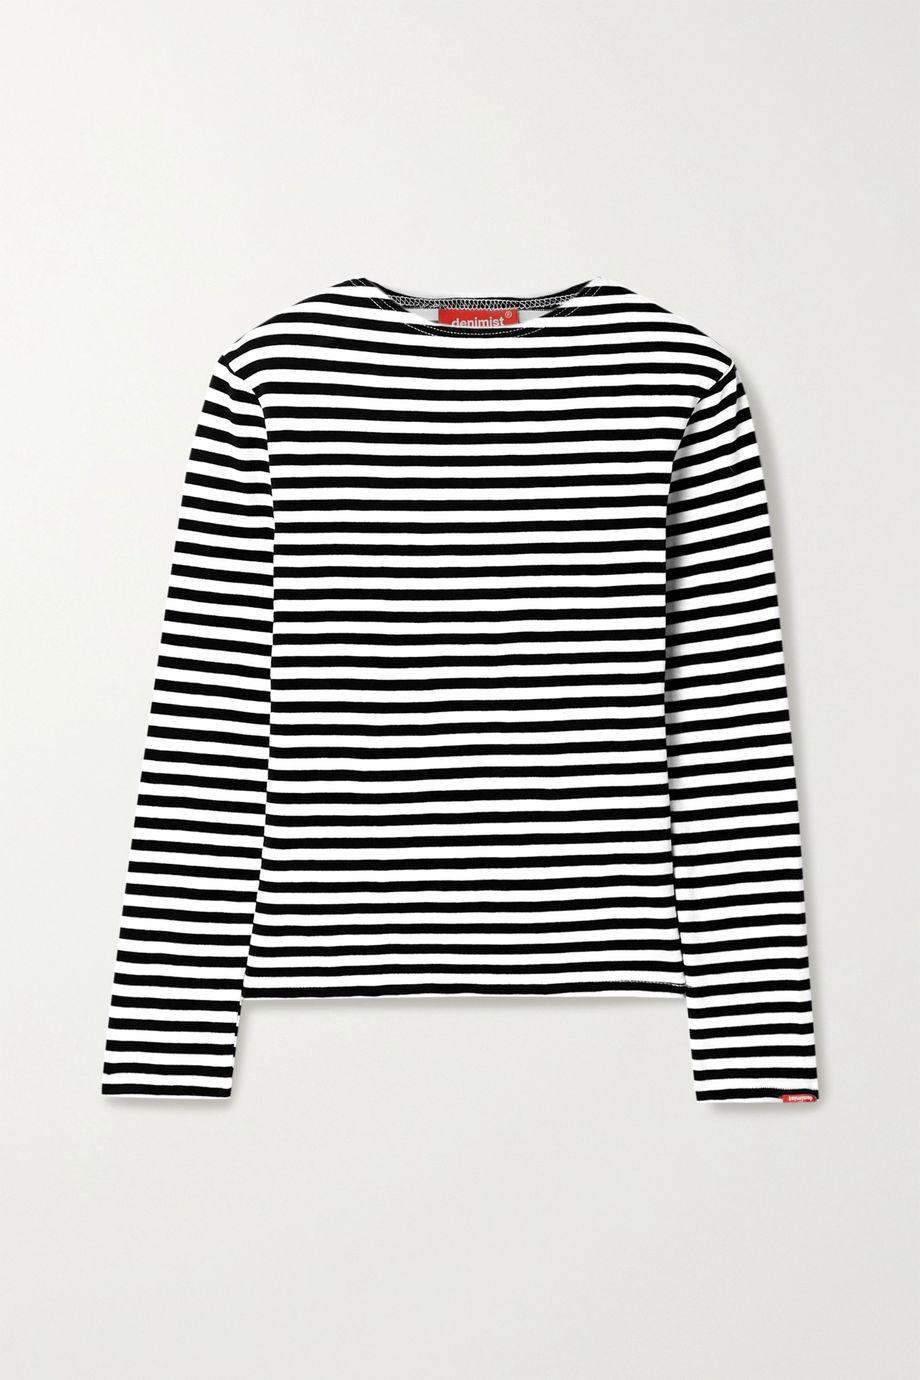 Denimist Striped cotton-jersey top